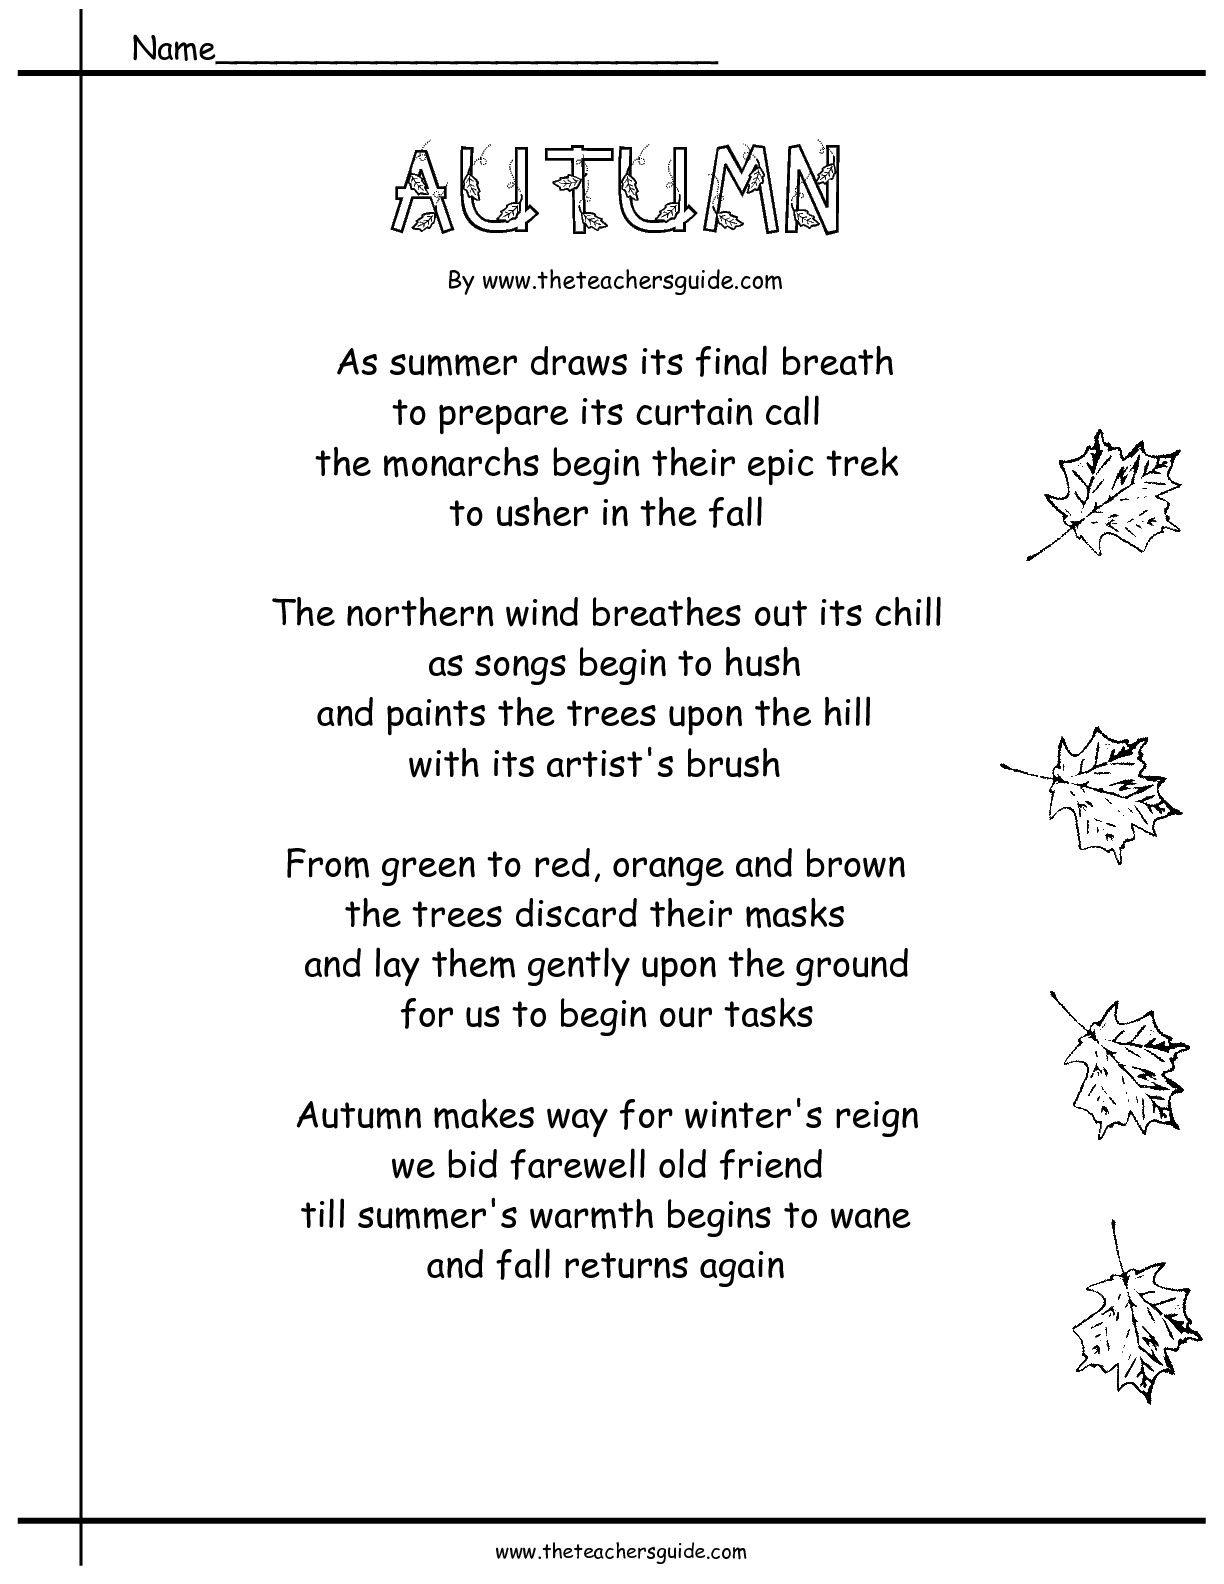 Poems Bout Utumn Utumn Poem With Prehensi Questi S